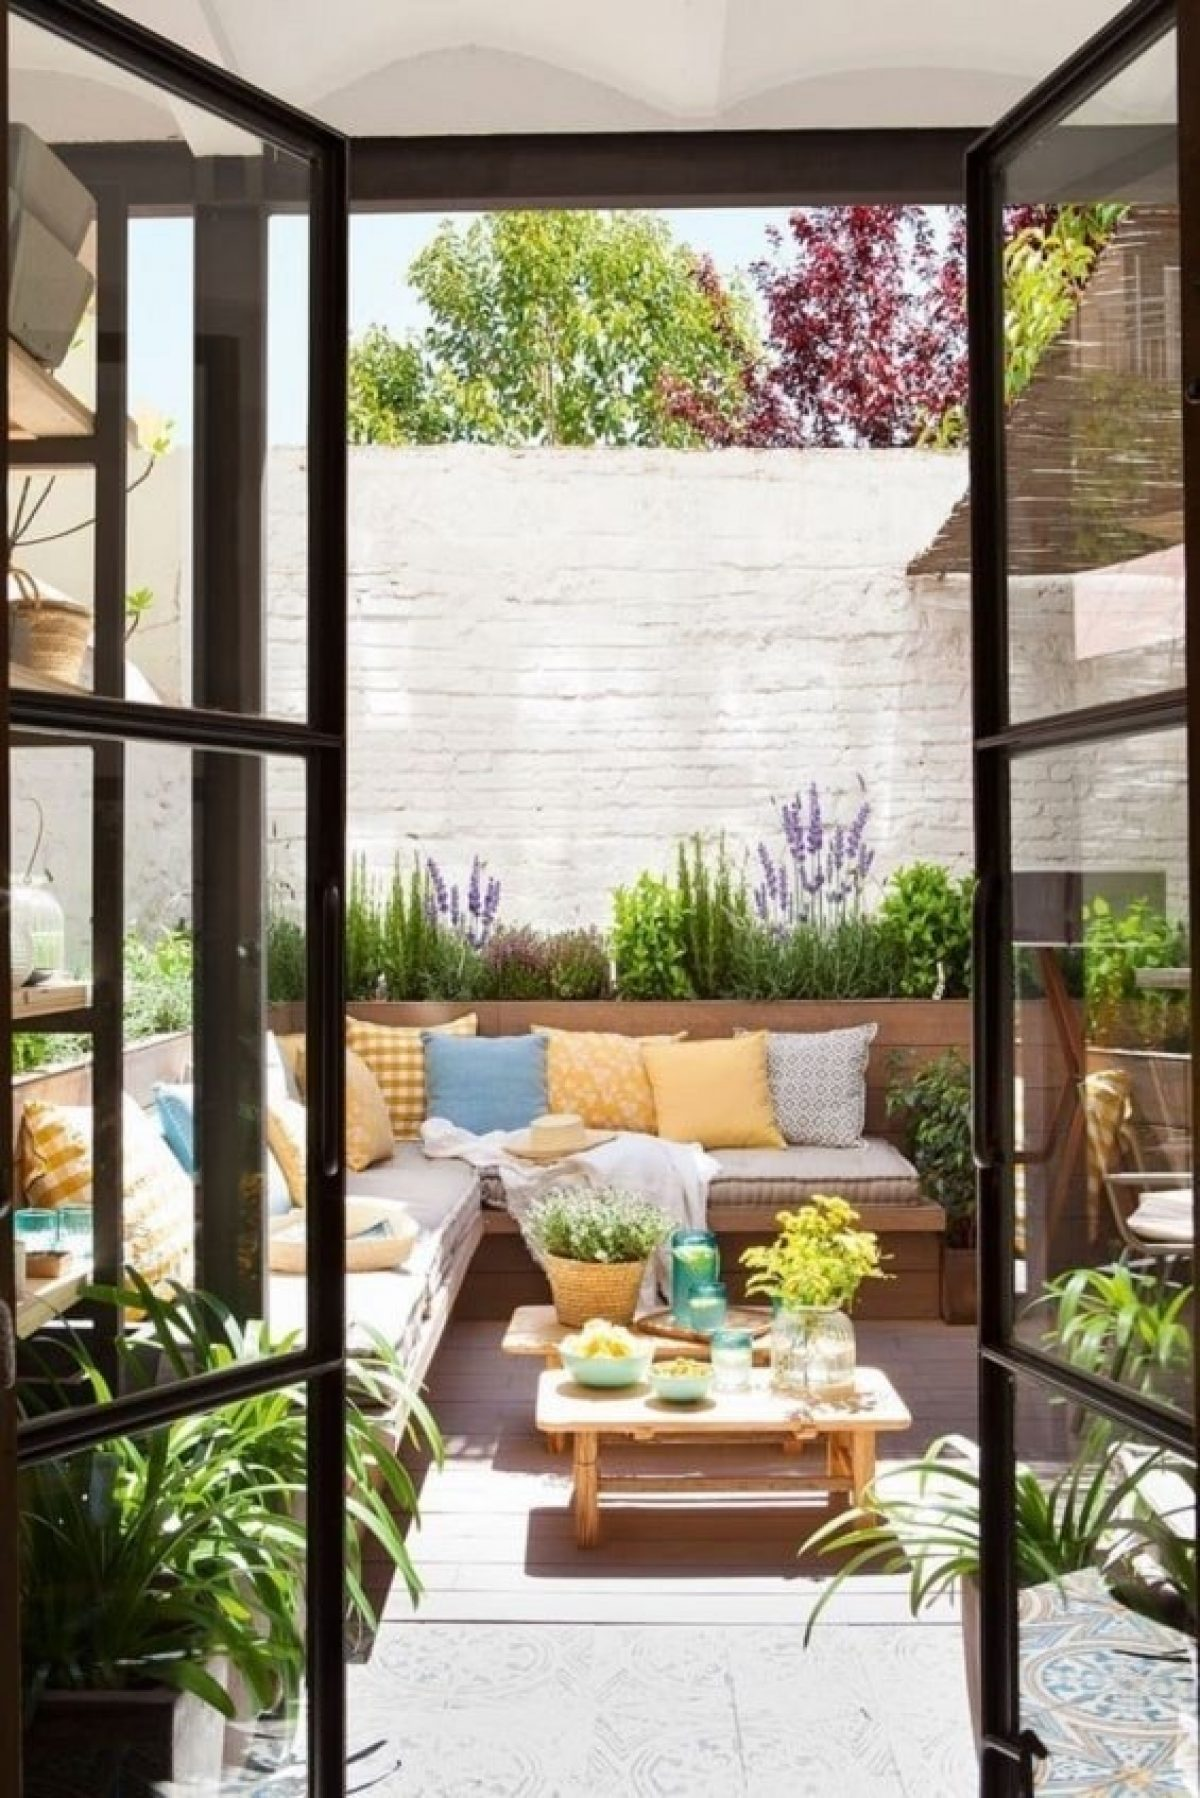 Desain Taman Belakang Rumah Minimalis Modern